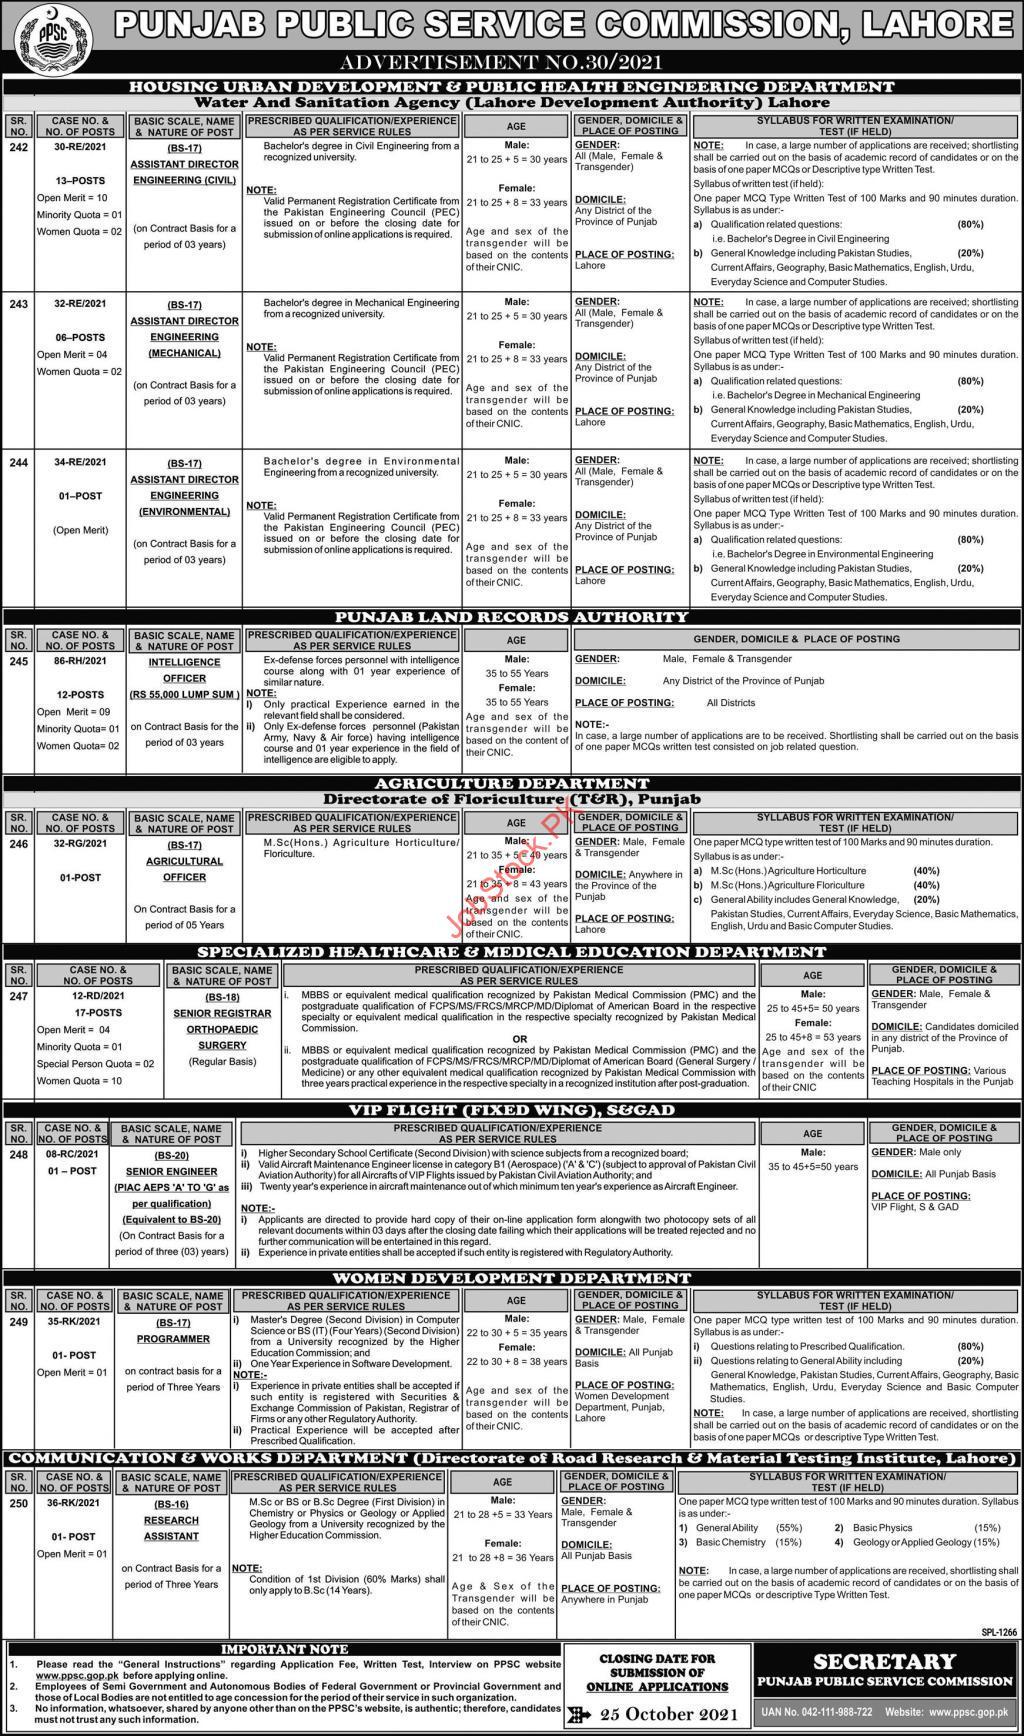 PPSC Jobs 2021 Latest Advertisement No.30.2021 Apply Online